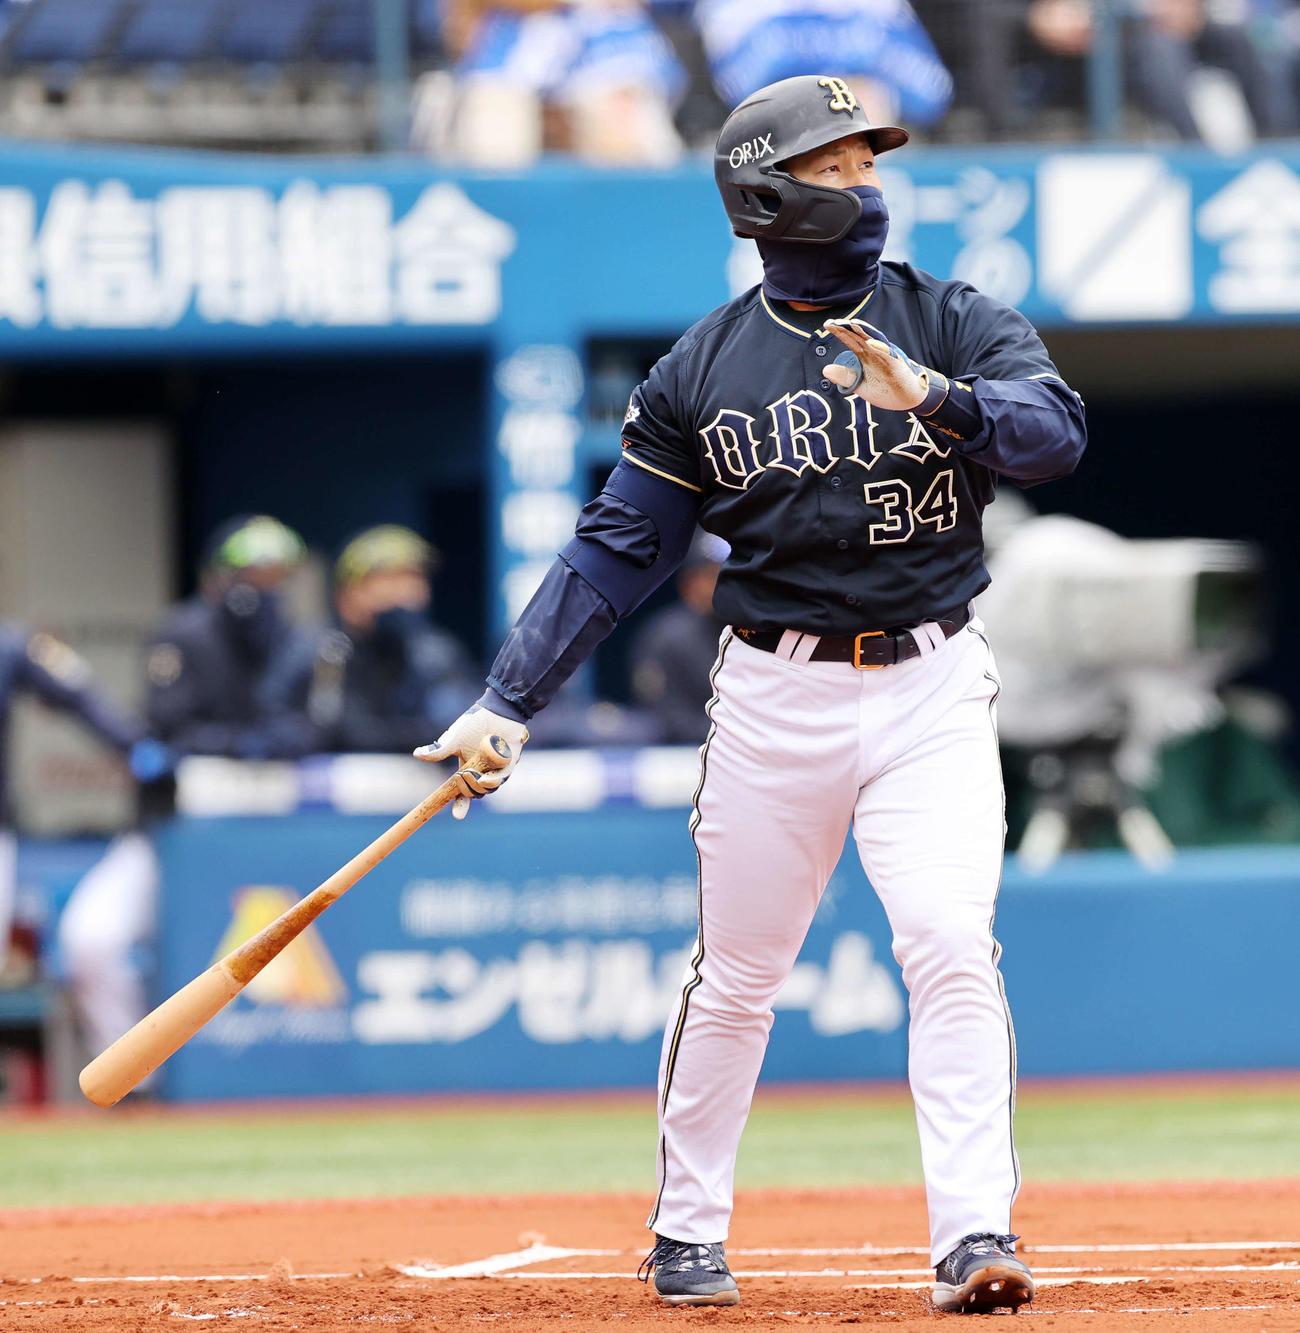 DeNA対オリックス 1回表オリックス1死、吉田正は右越え本塁打を放つ(撮影・鈴木正人)